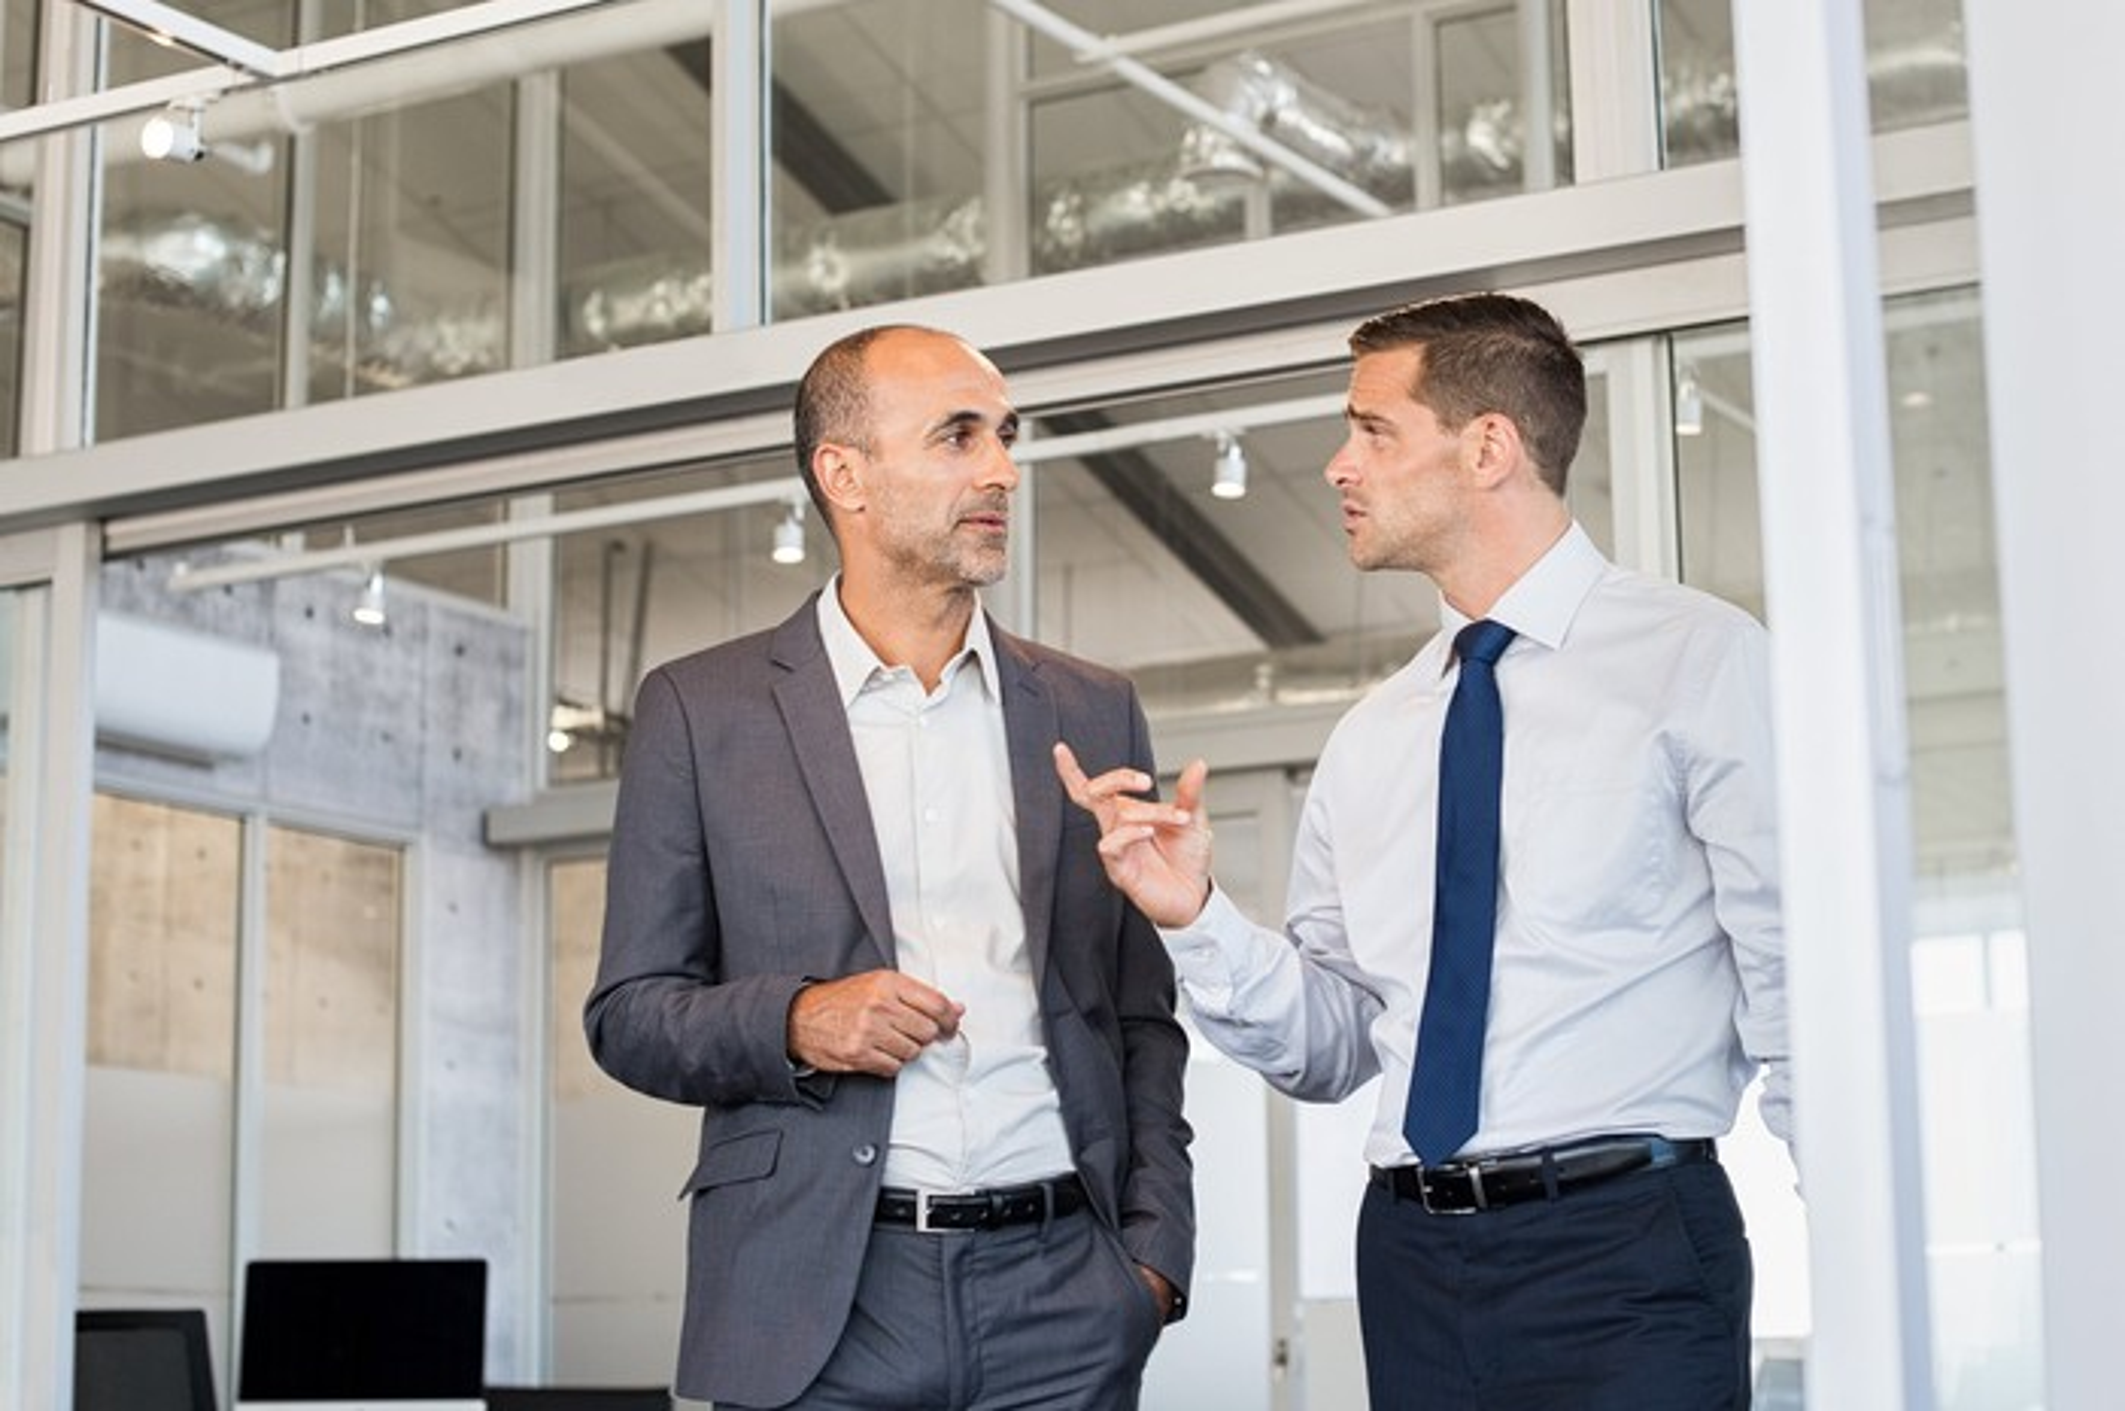 Two men in professional attire having a discussion.